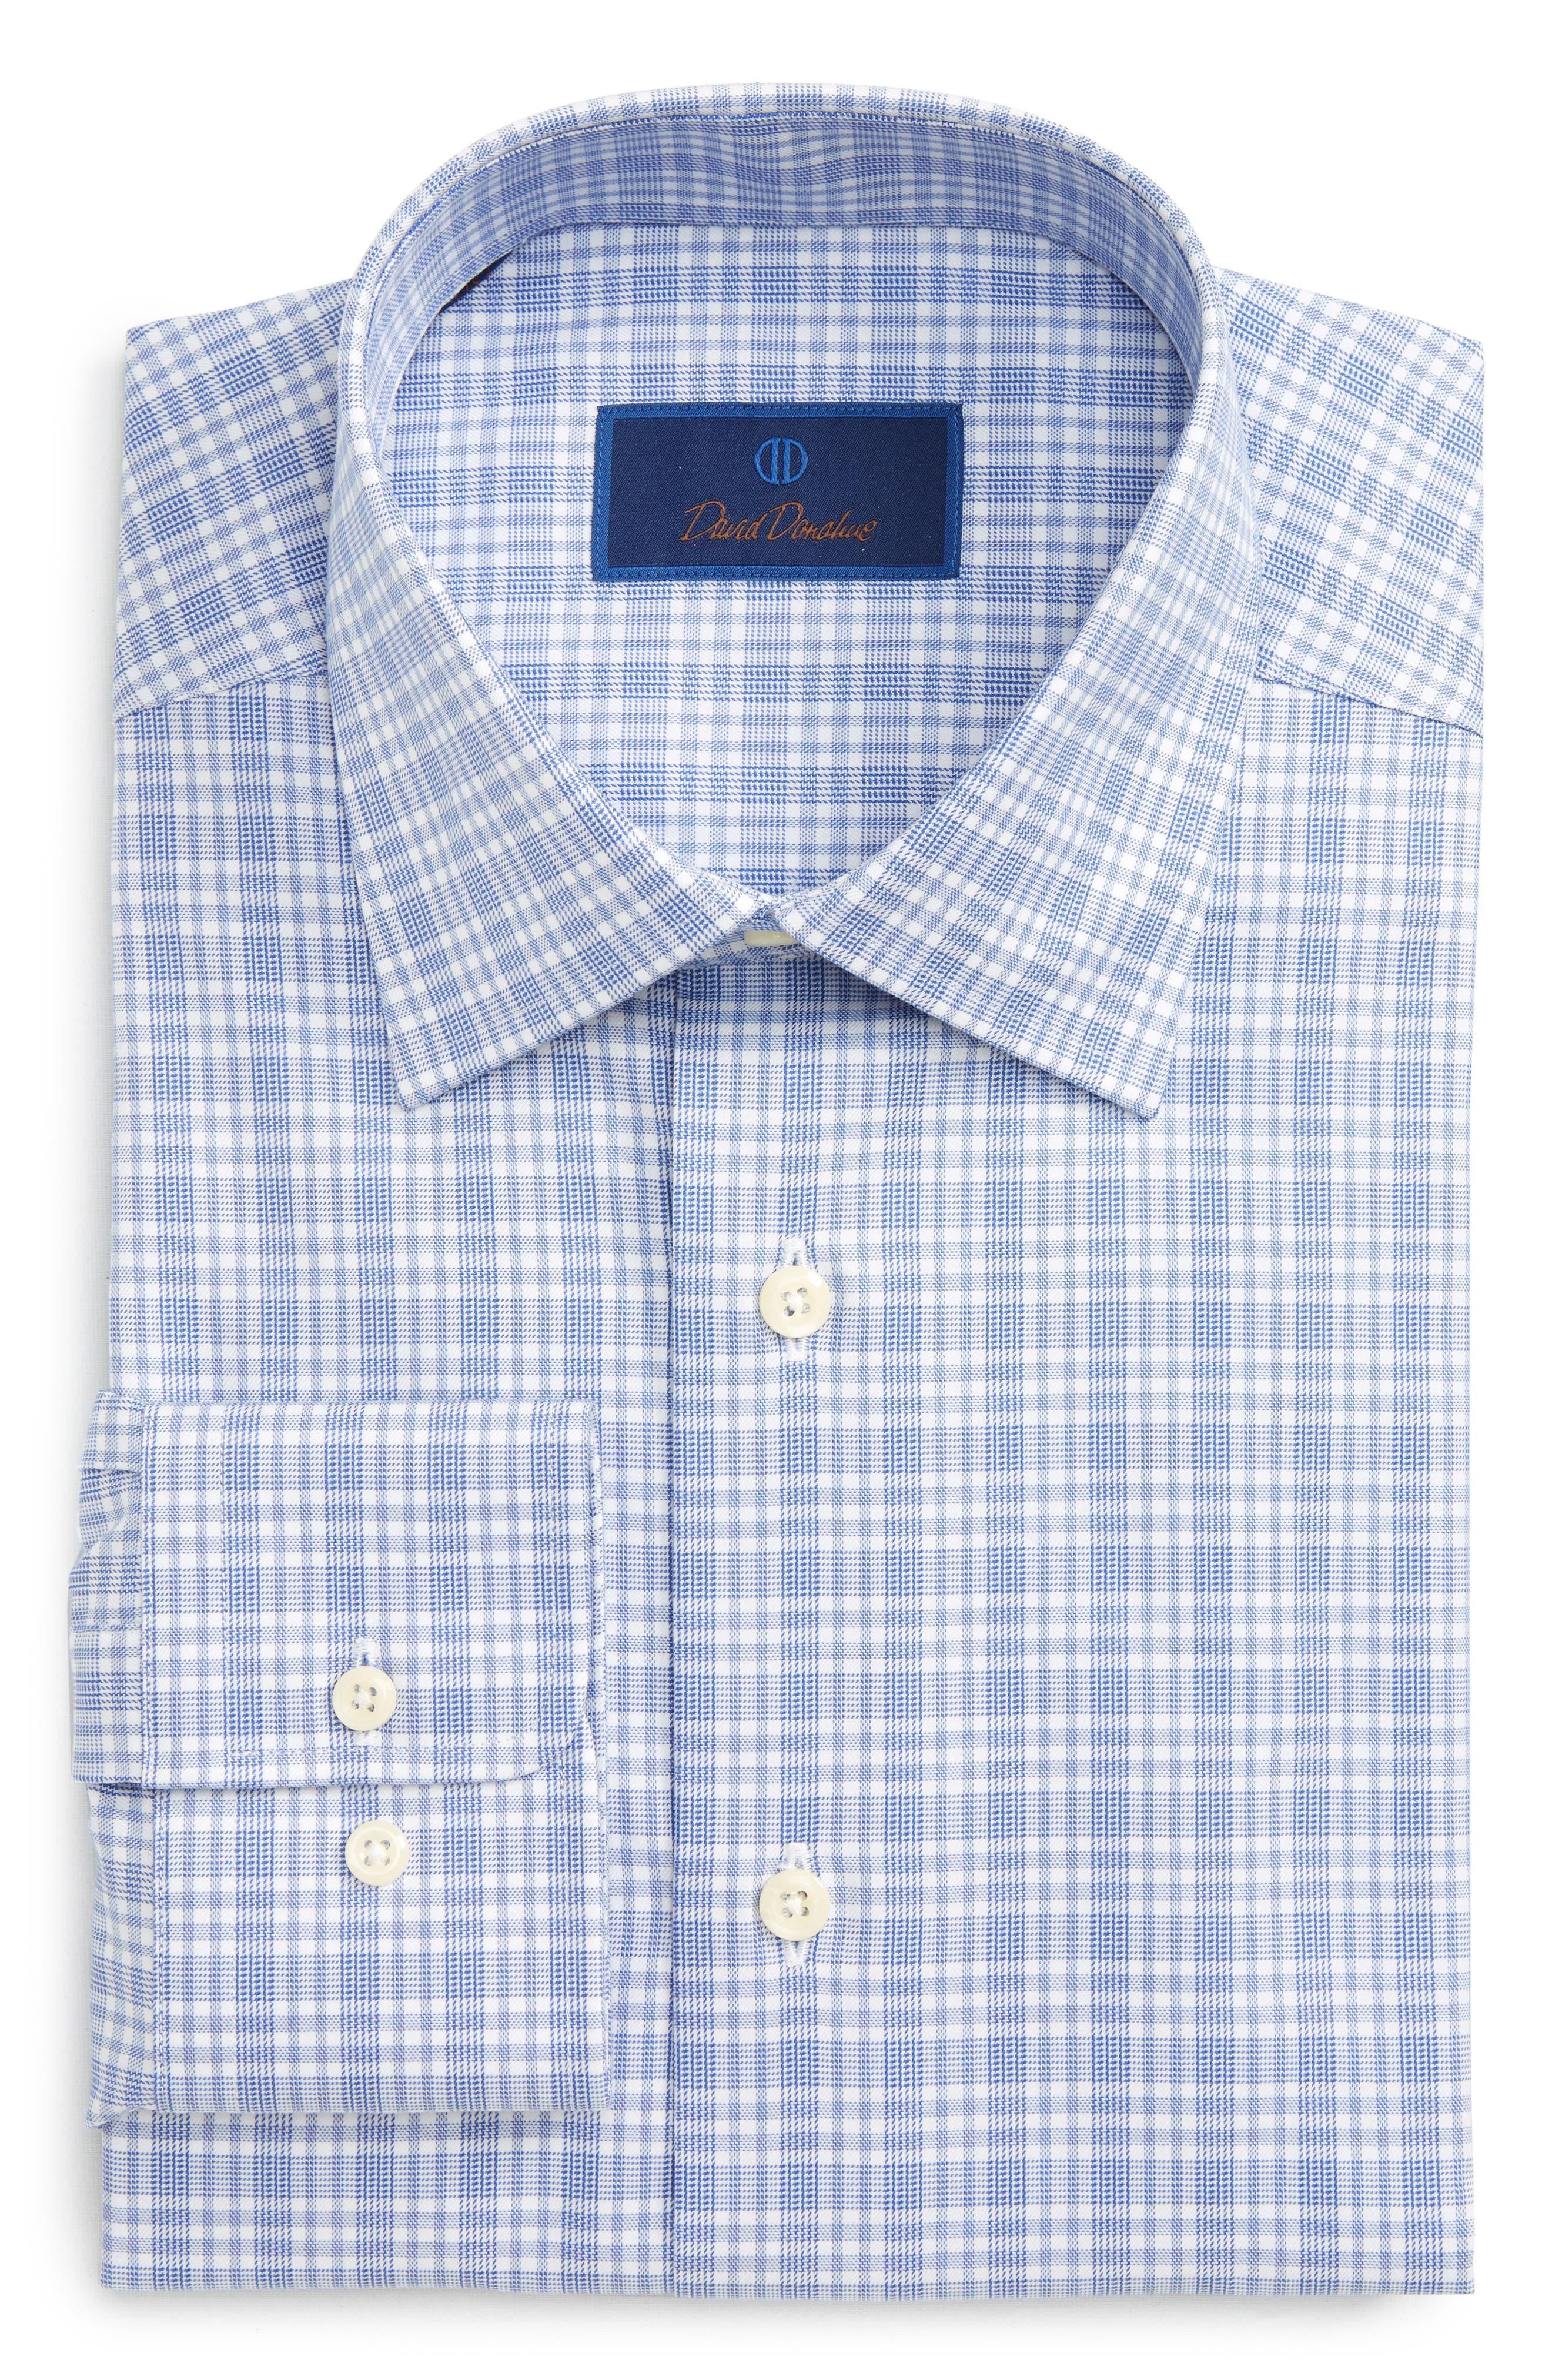 Alternate Image 1 Selected - David Donahue Regular Fit Plaid Dress Shirt